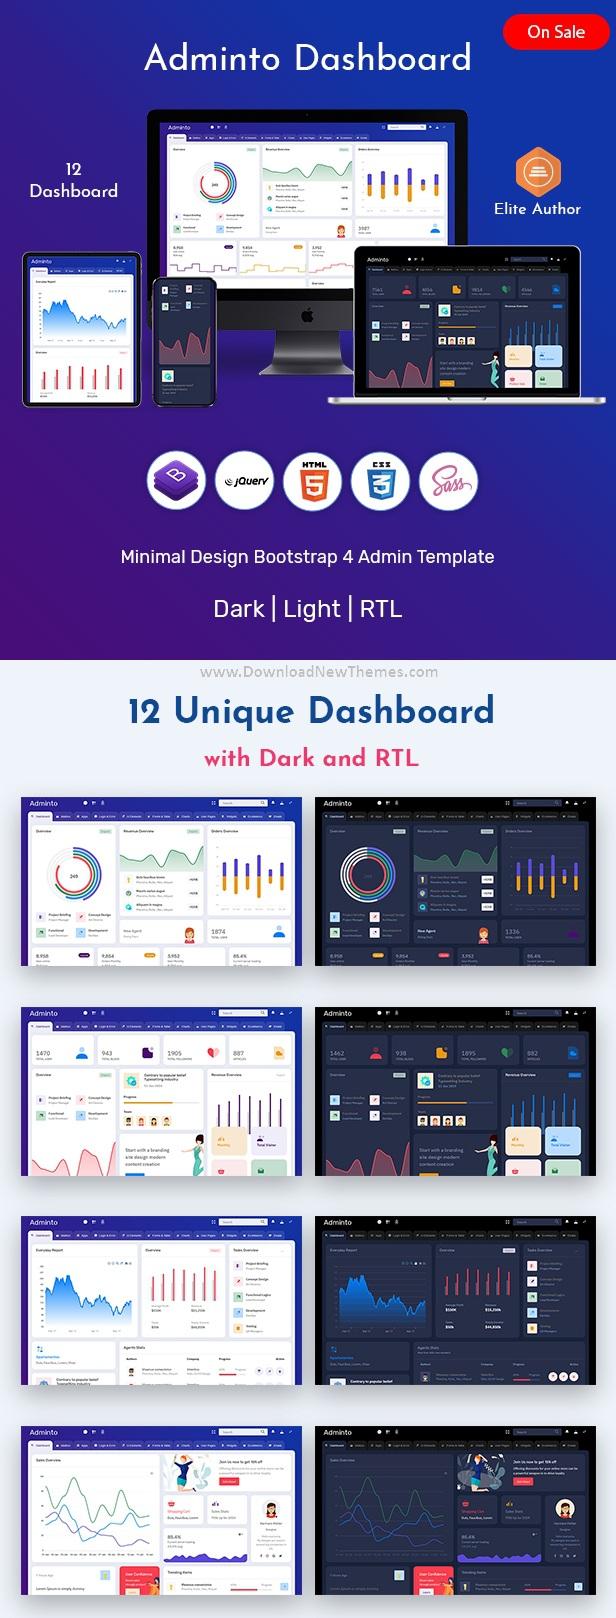 Best Bootstrap Admin Dashboard Template